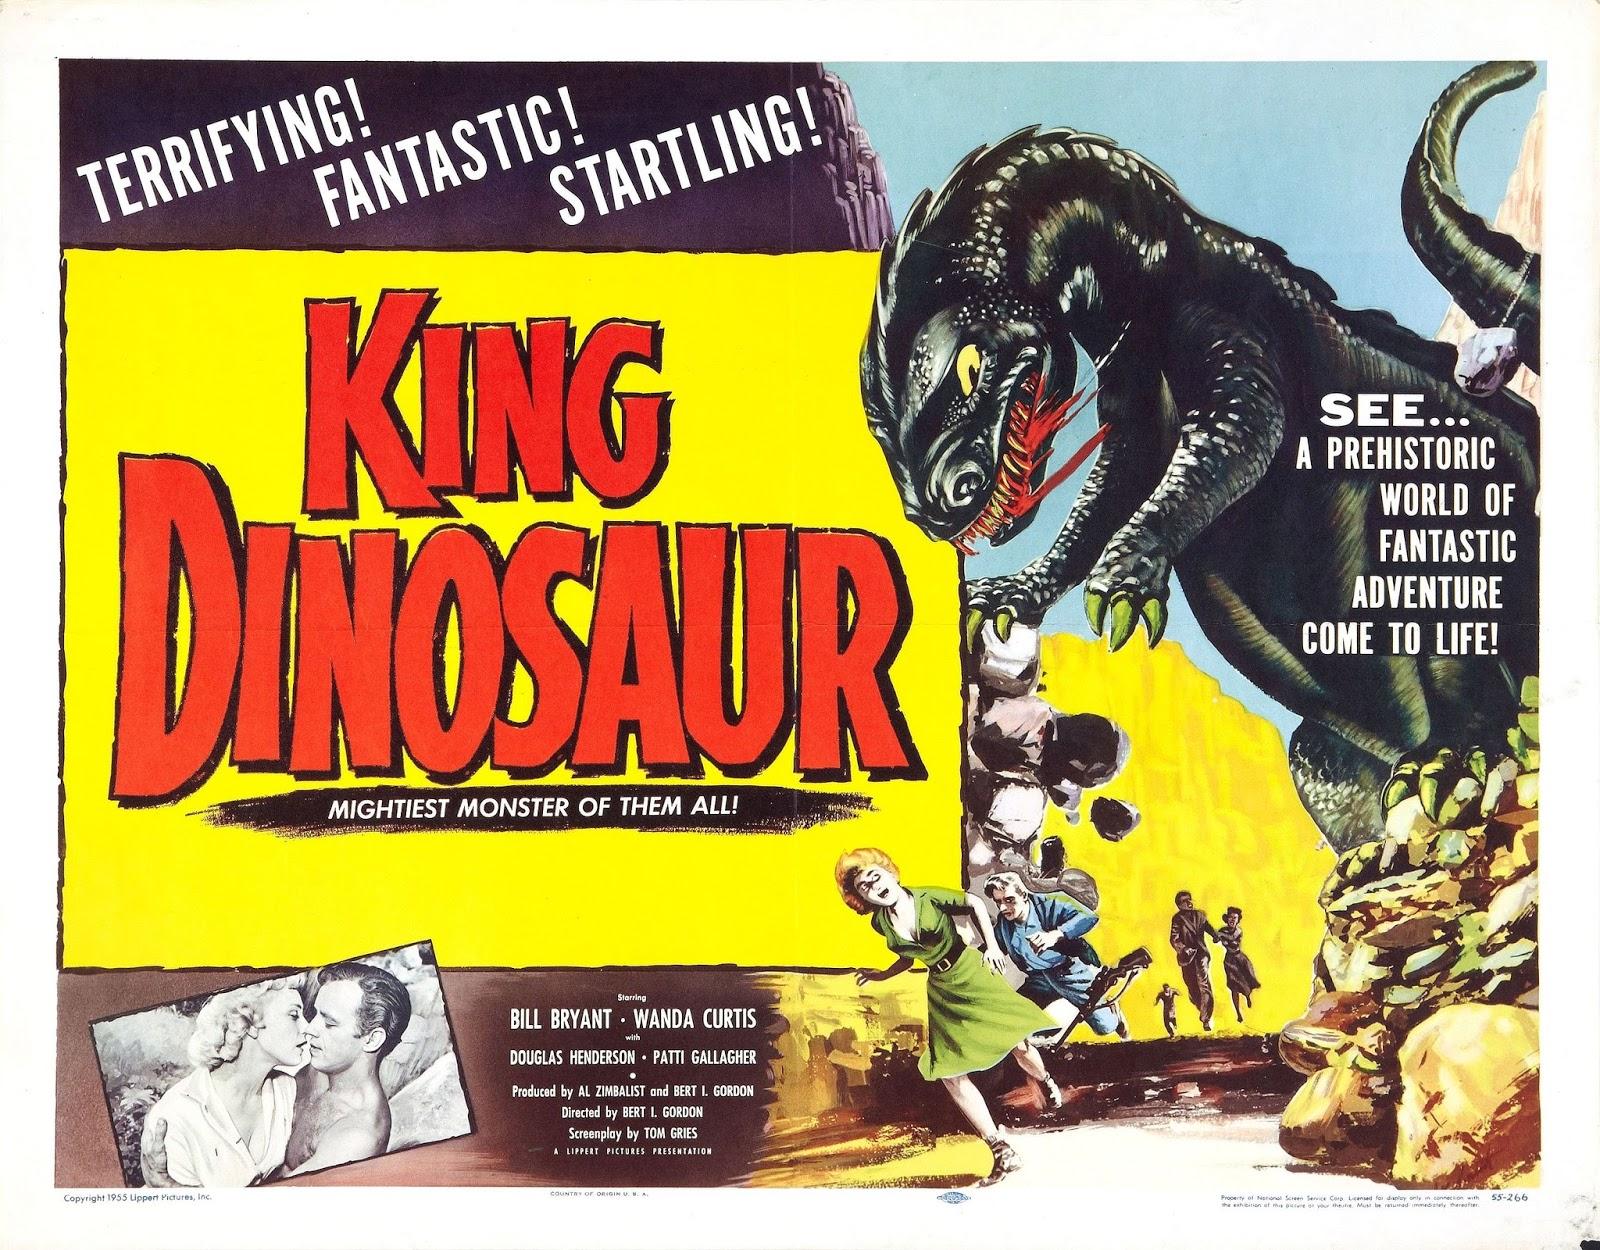 Dinosa king sex erotic image